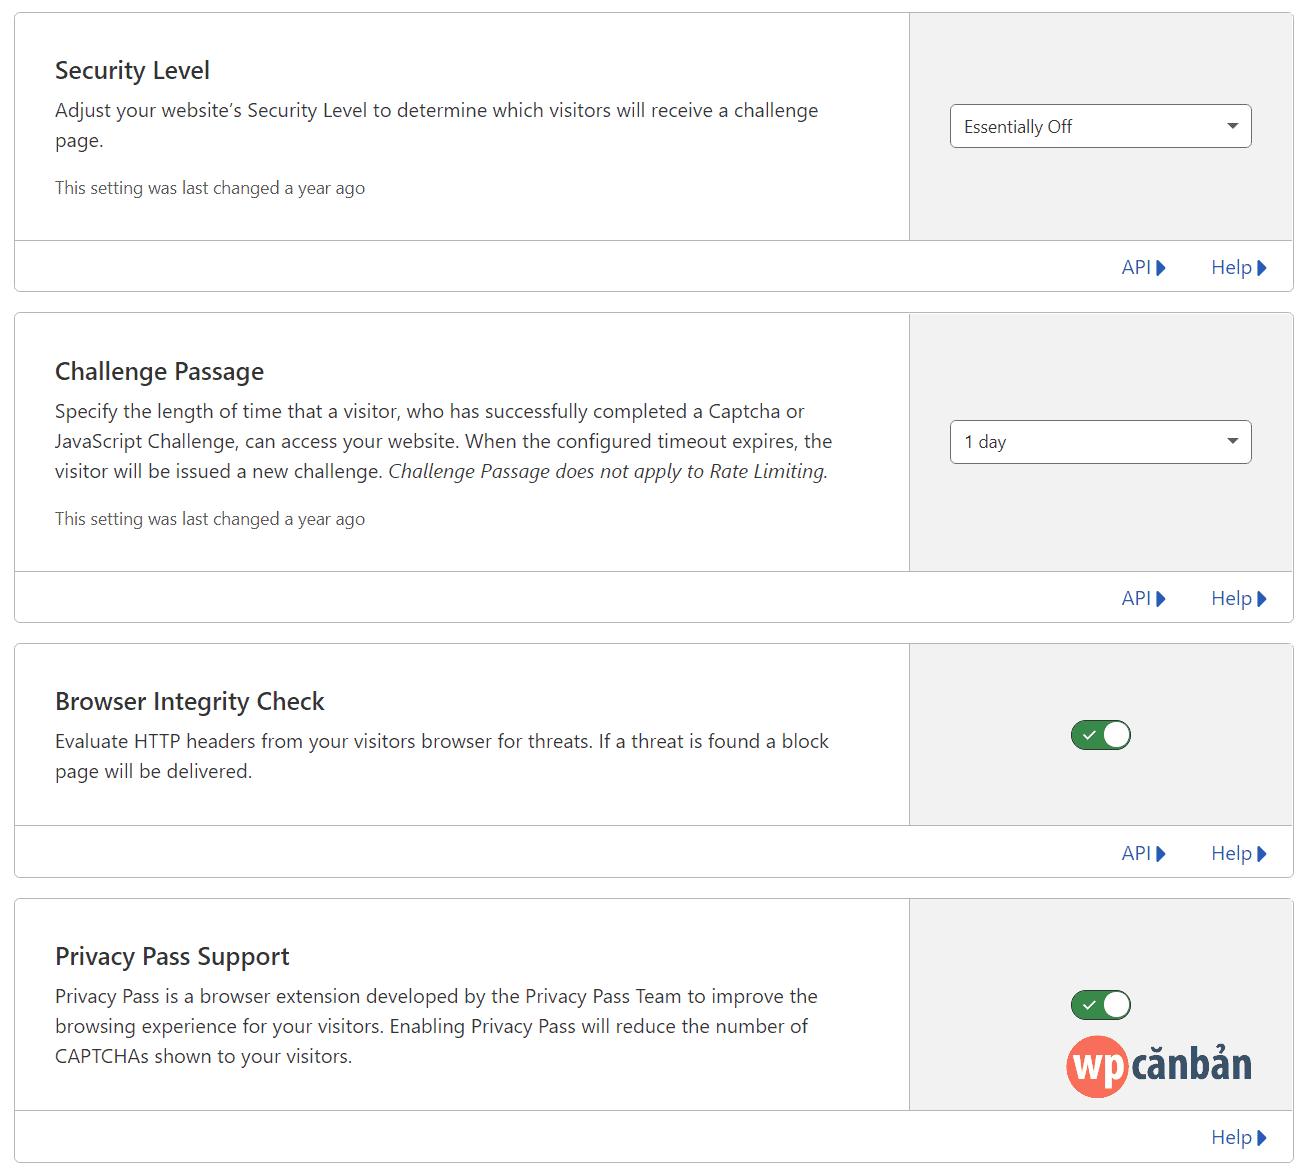 cloudflare-firewall-settings